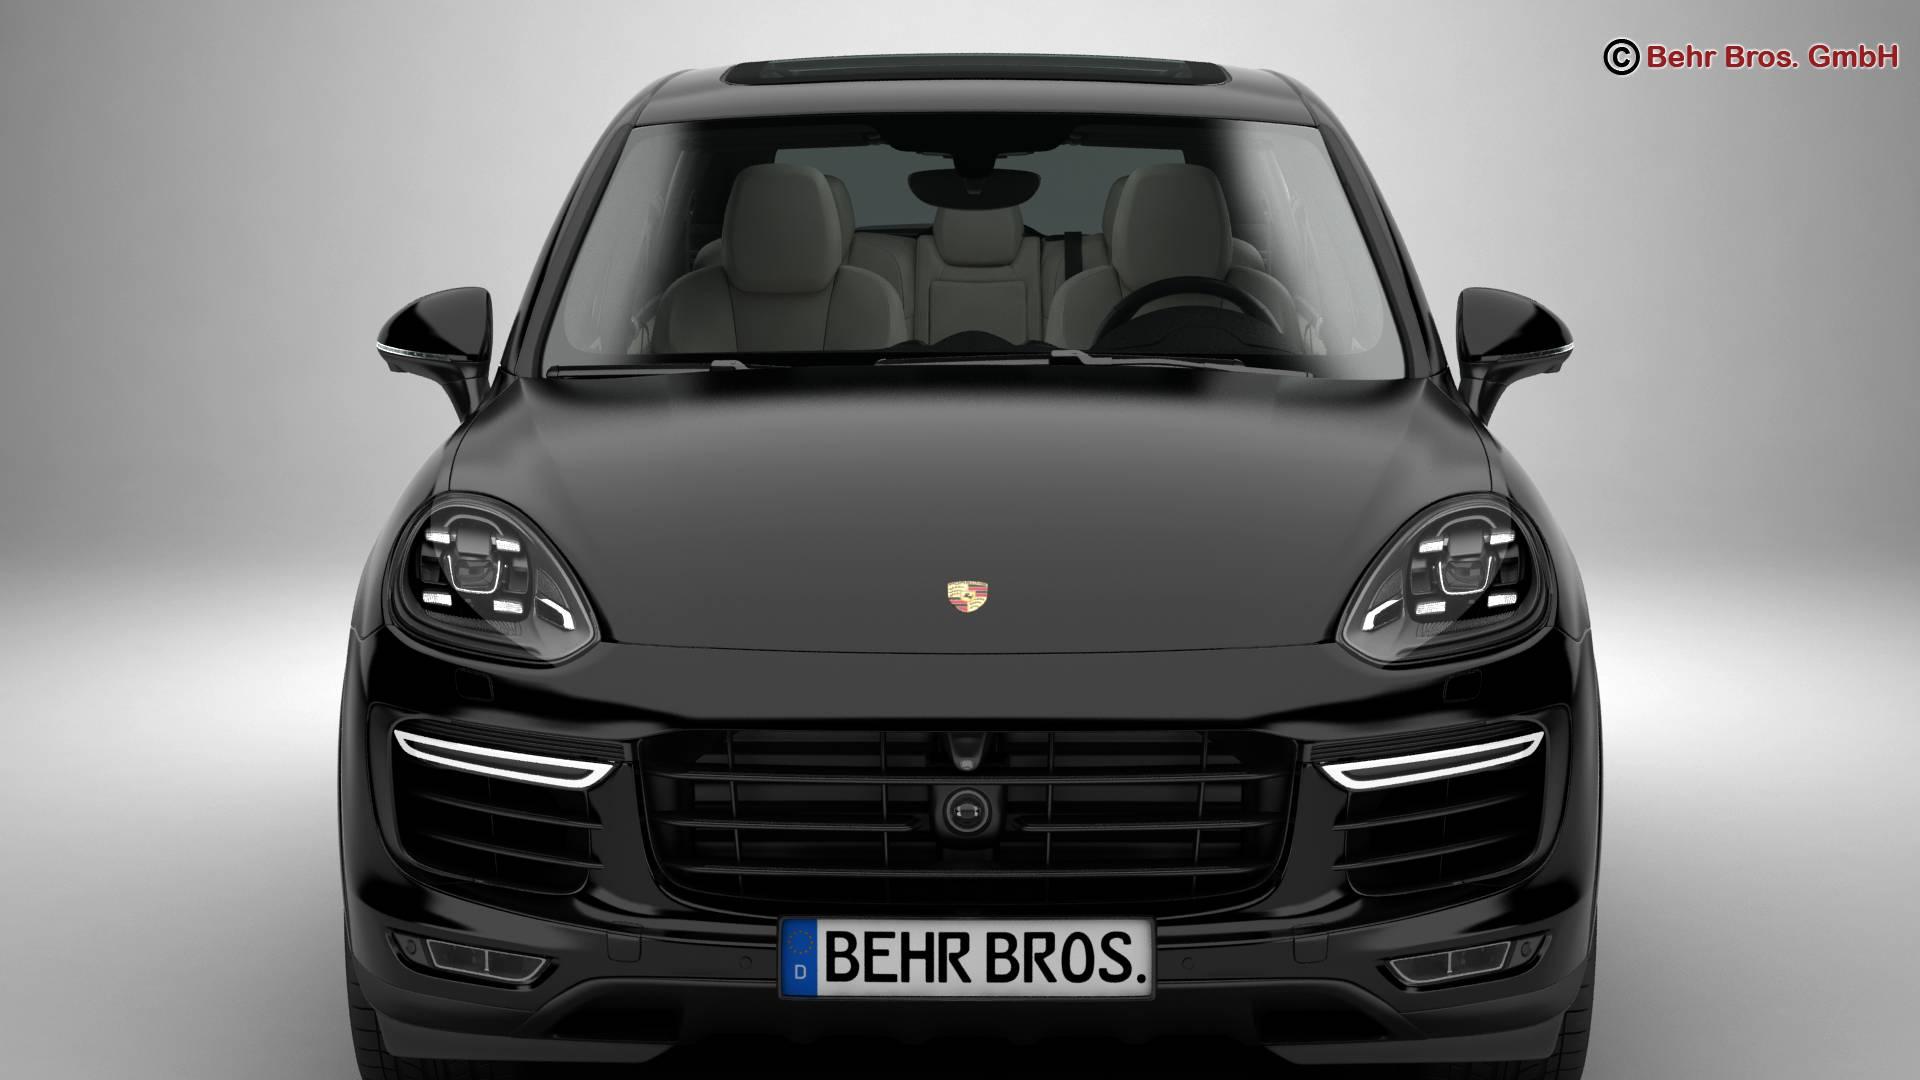 porsche cayenne turbo s 2016 3d model 3ds max fbx c4d lwo ma mb obj 214932